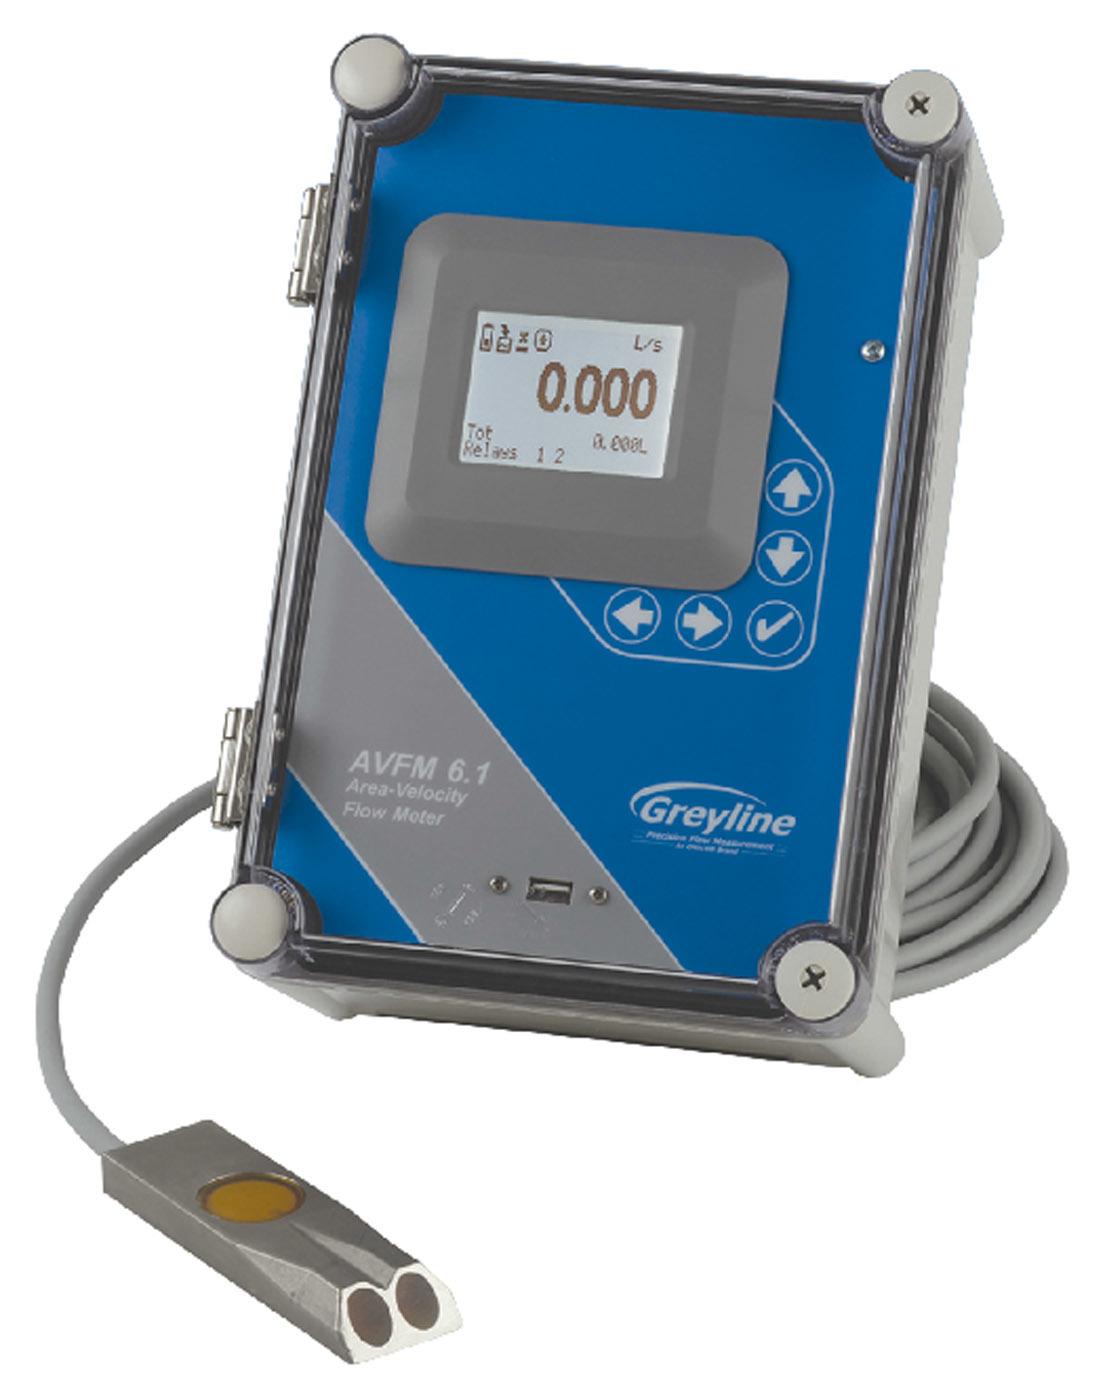 AVFM 6.1 area-velocity flowmeter from Greyline Instruments